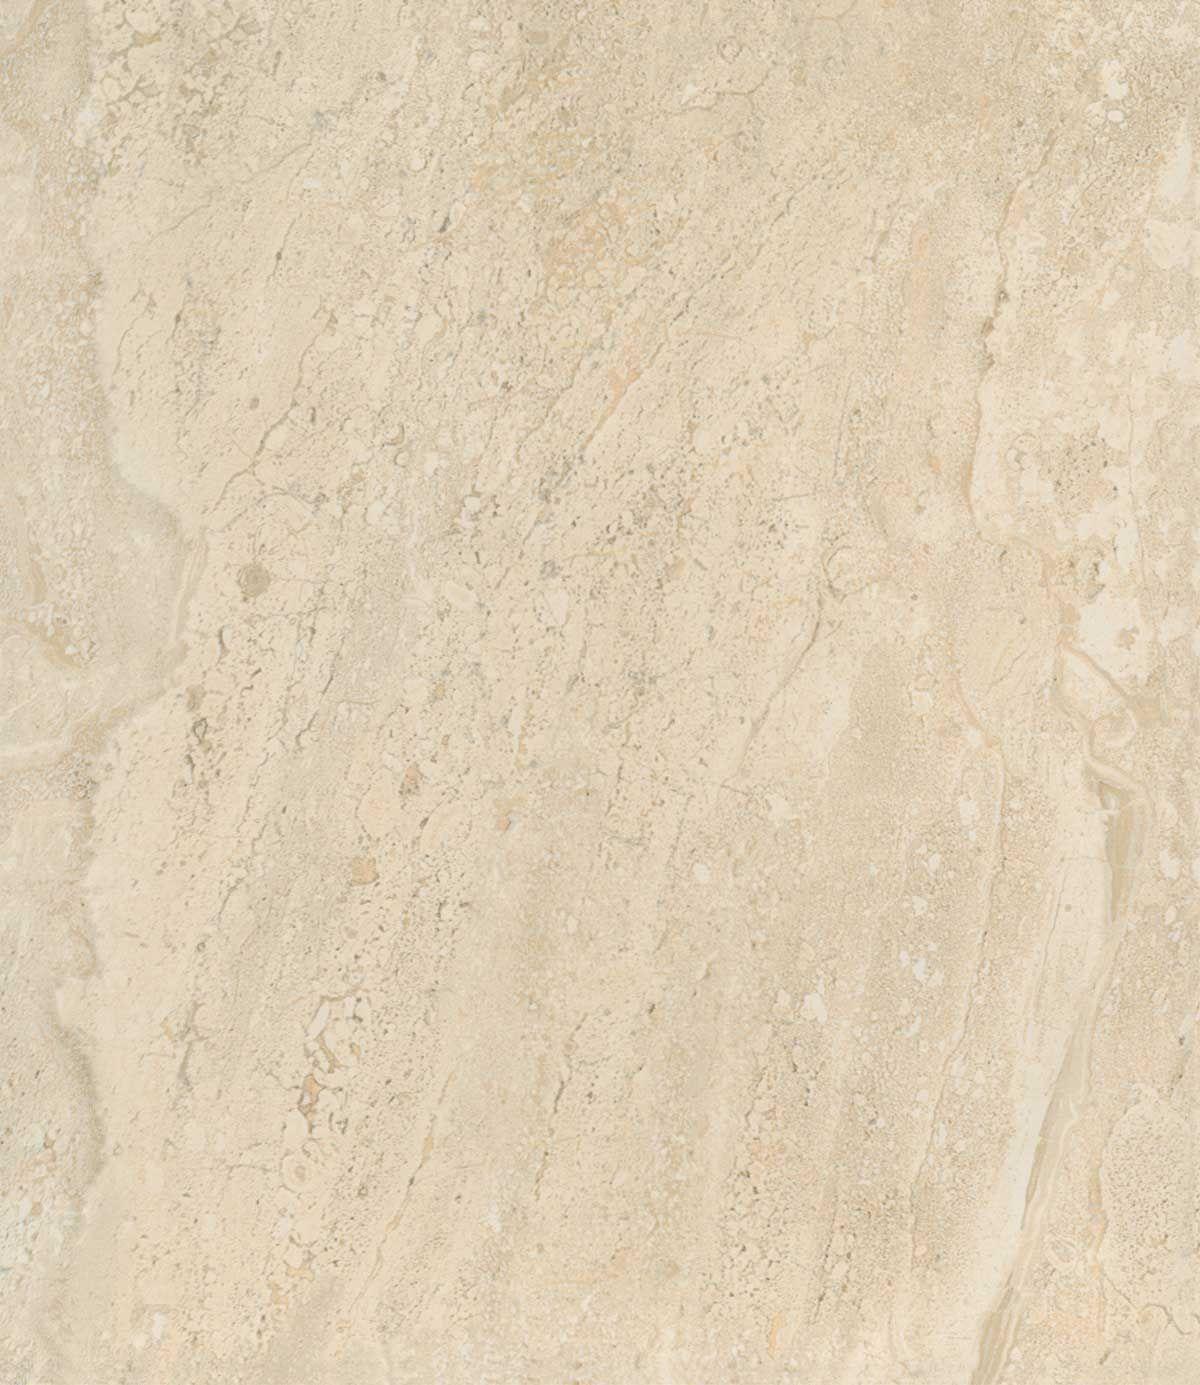 Positano beige glazed porcelain floor by roca porcelain tiles by positano beige ceramic wall tile x dailygadgetfo Images